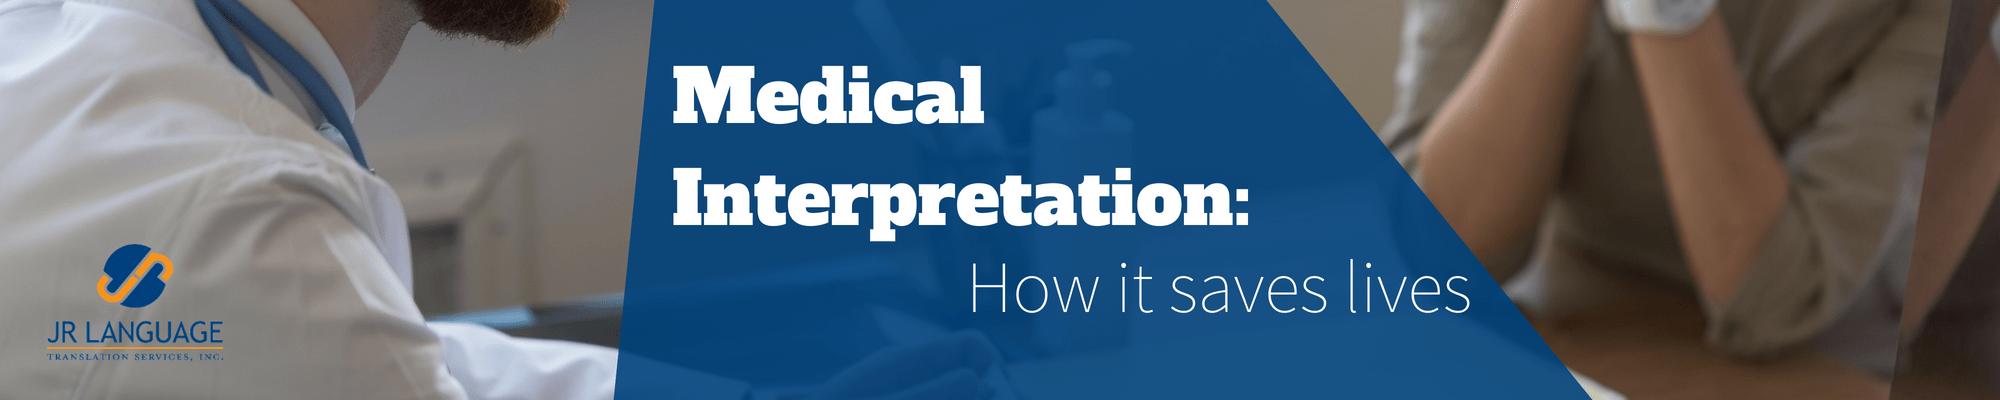 medical interpretation and how it saves lives